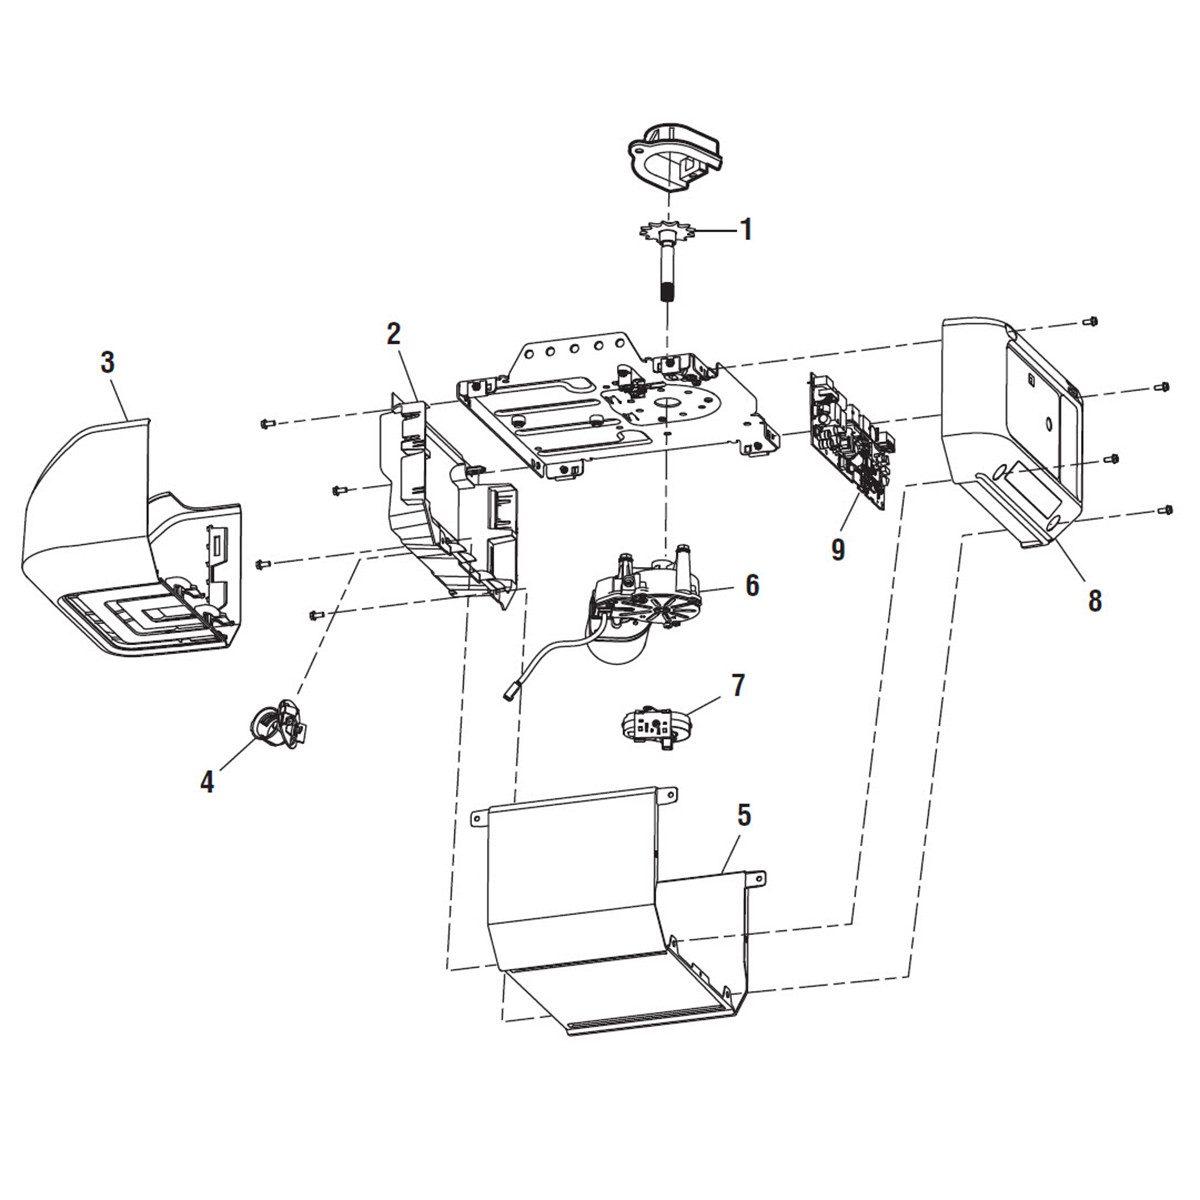 LiftMaster 8160 Replacement Parts | LiftMasterLiftMaster